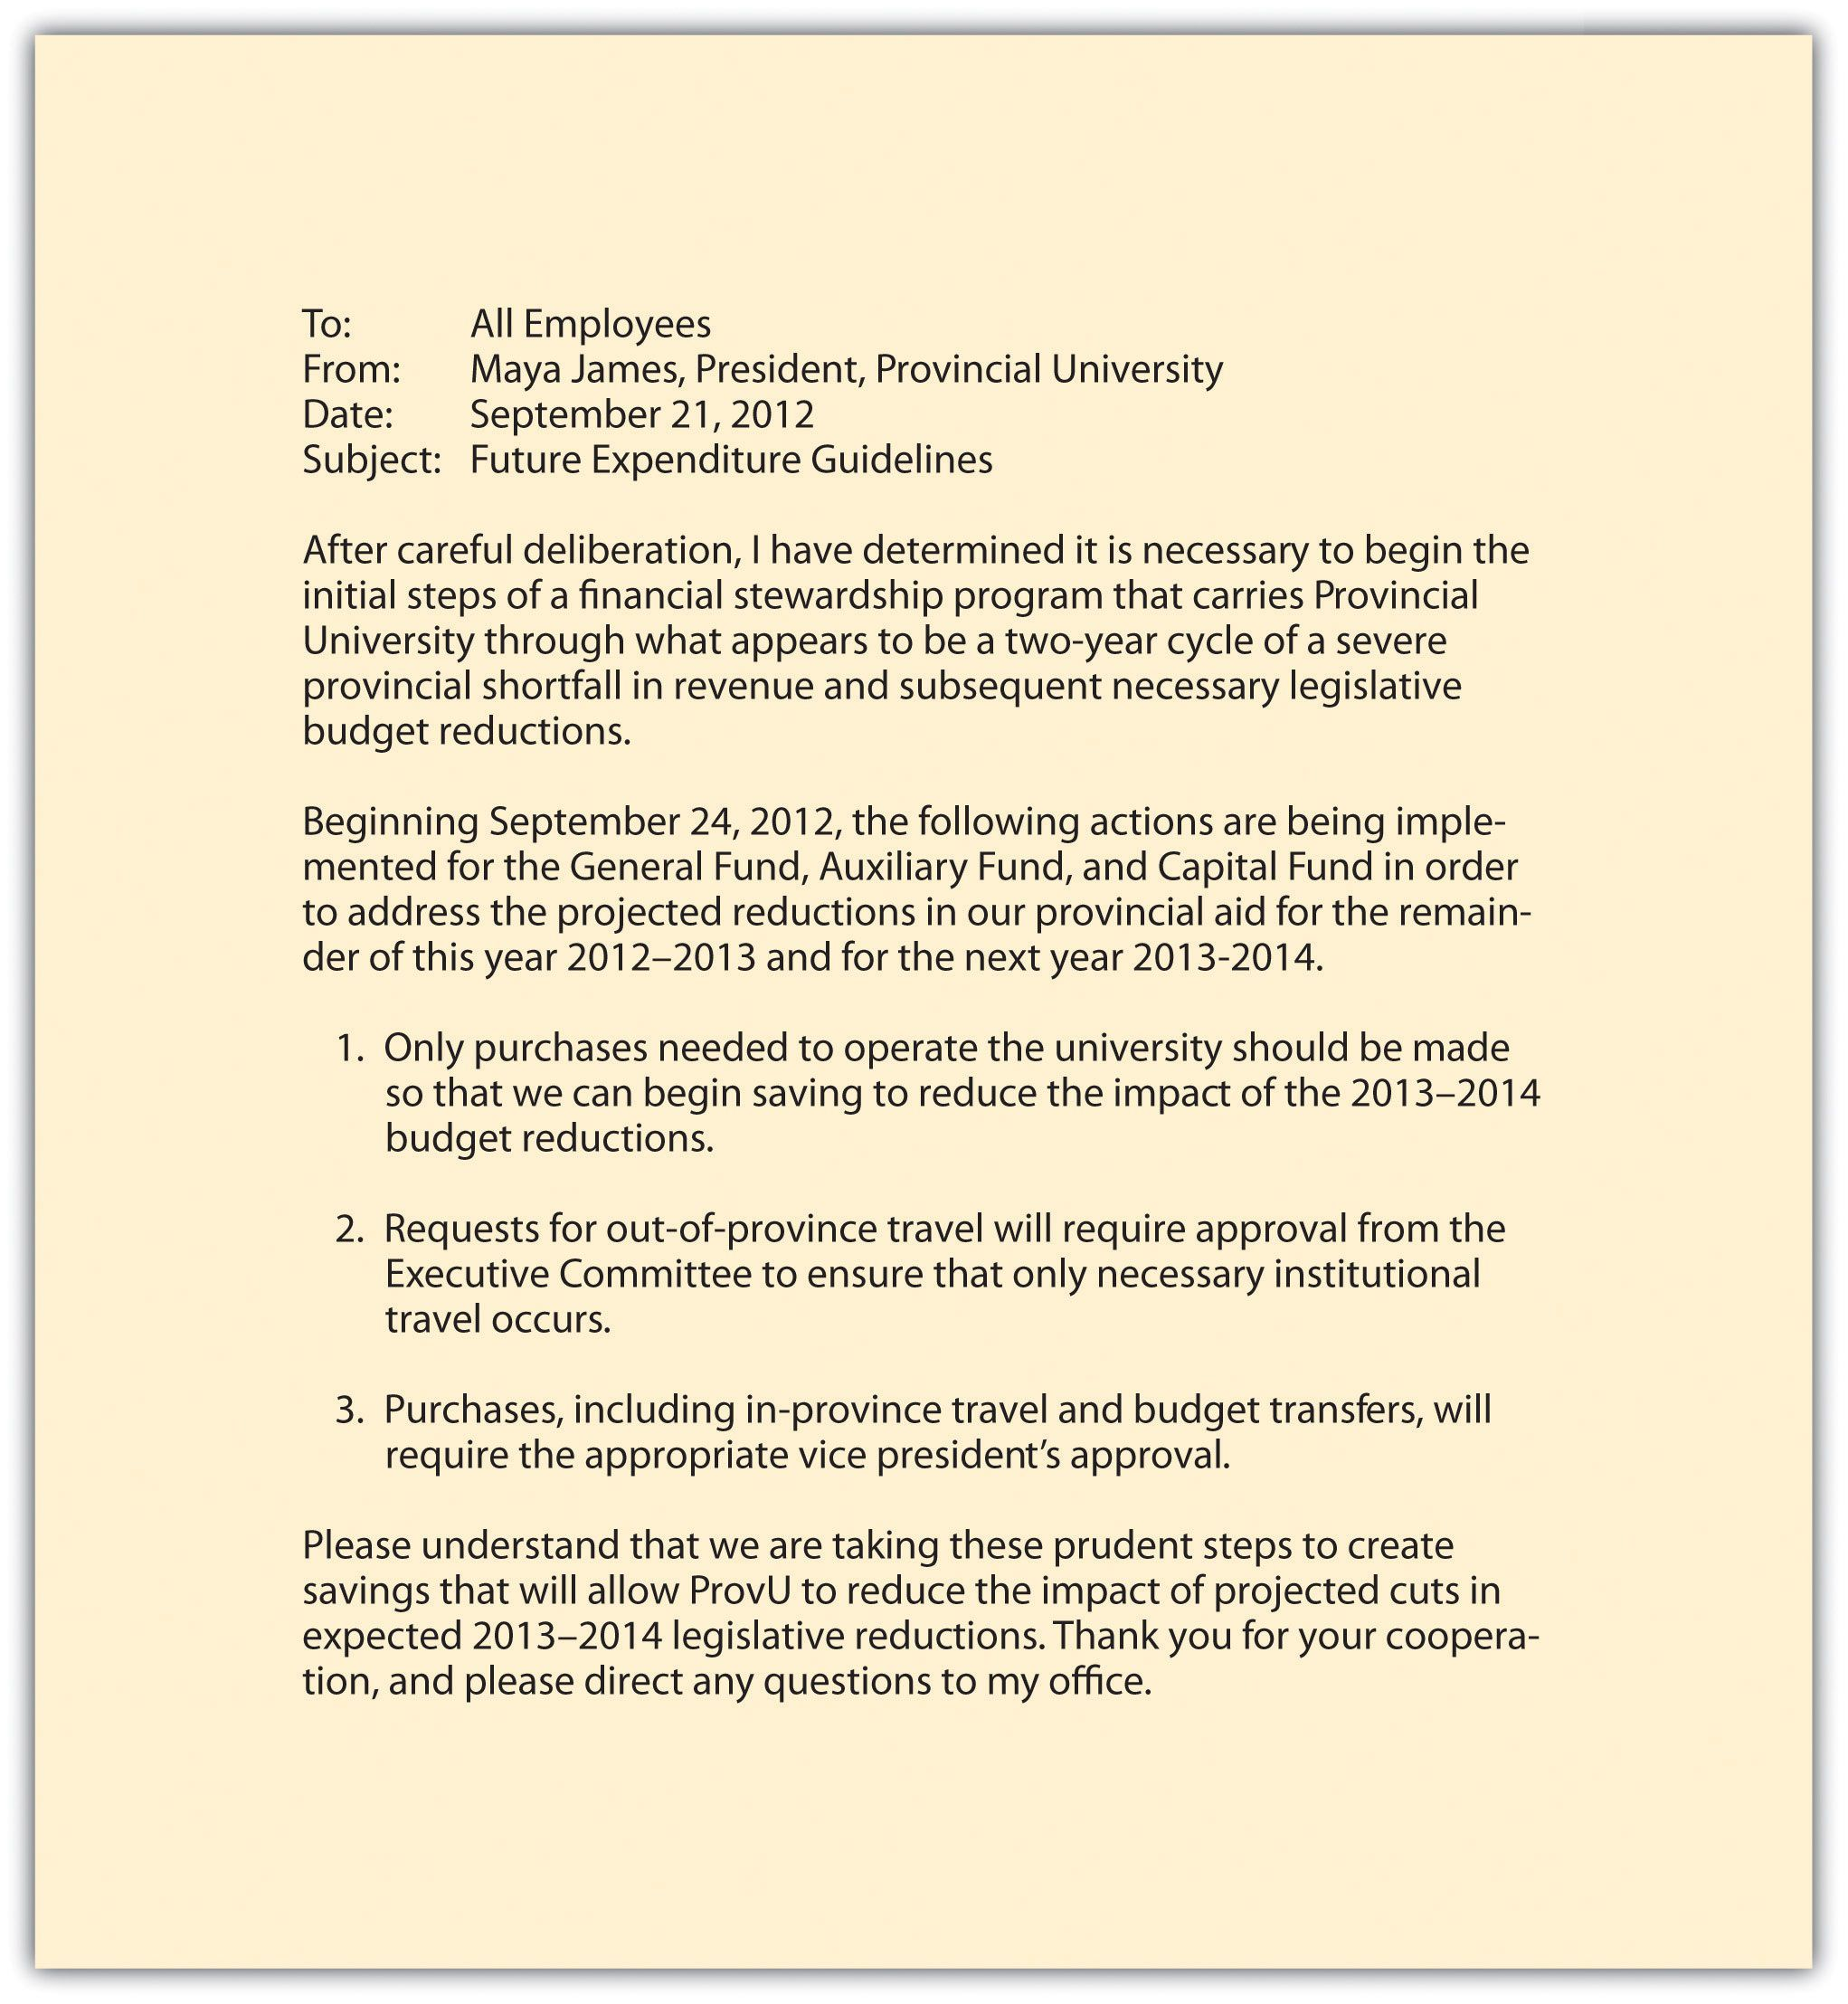 009 Fantastic Microsoft Word Professional Memorandum Template Highest Clarity  MemoFull